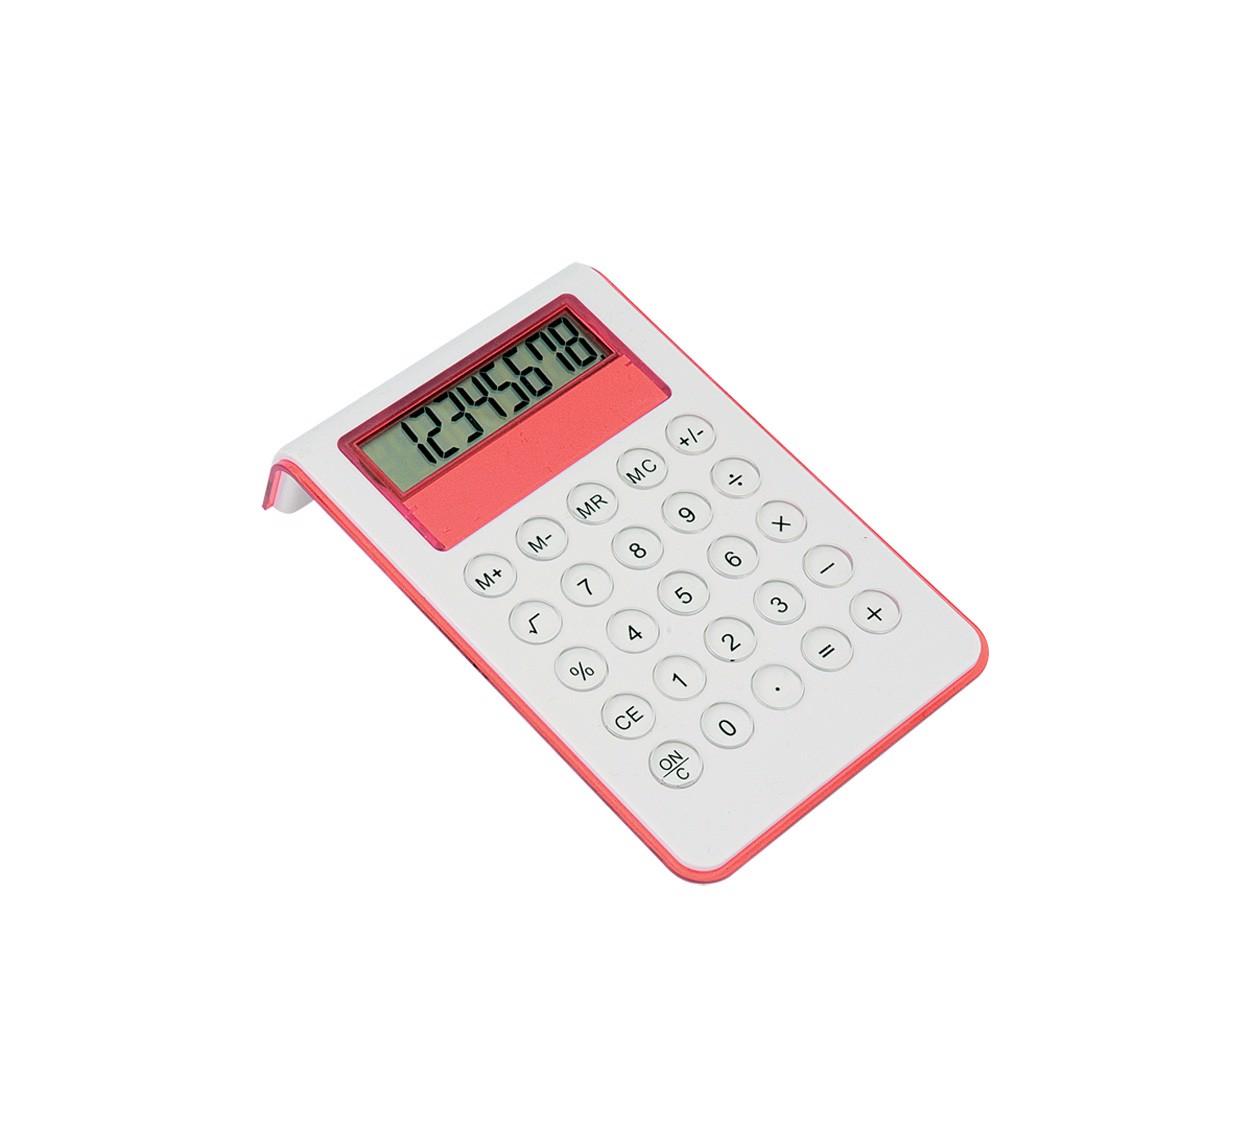 Kalkulačka Myd - Červená / Bílá